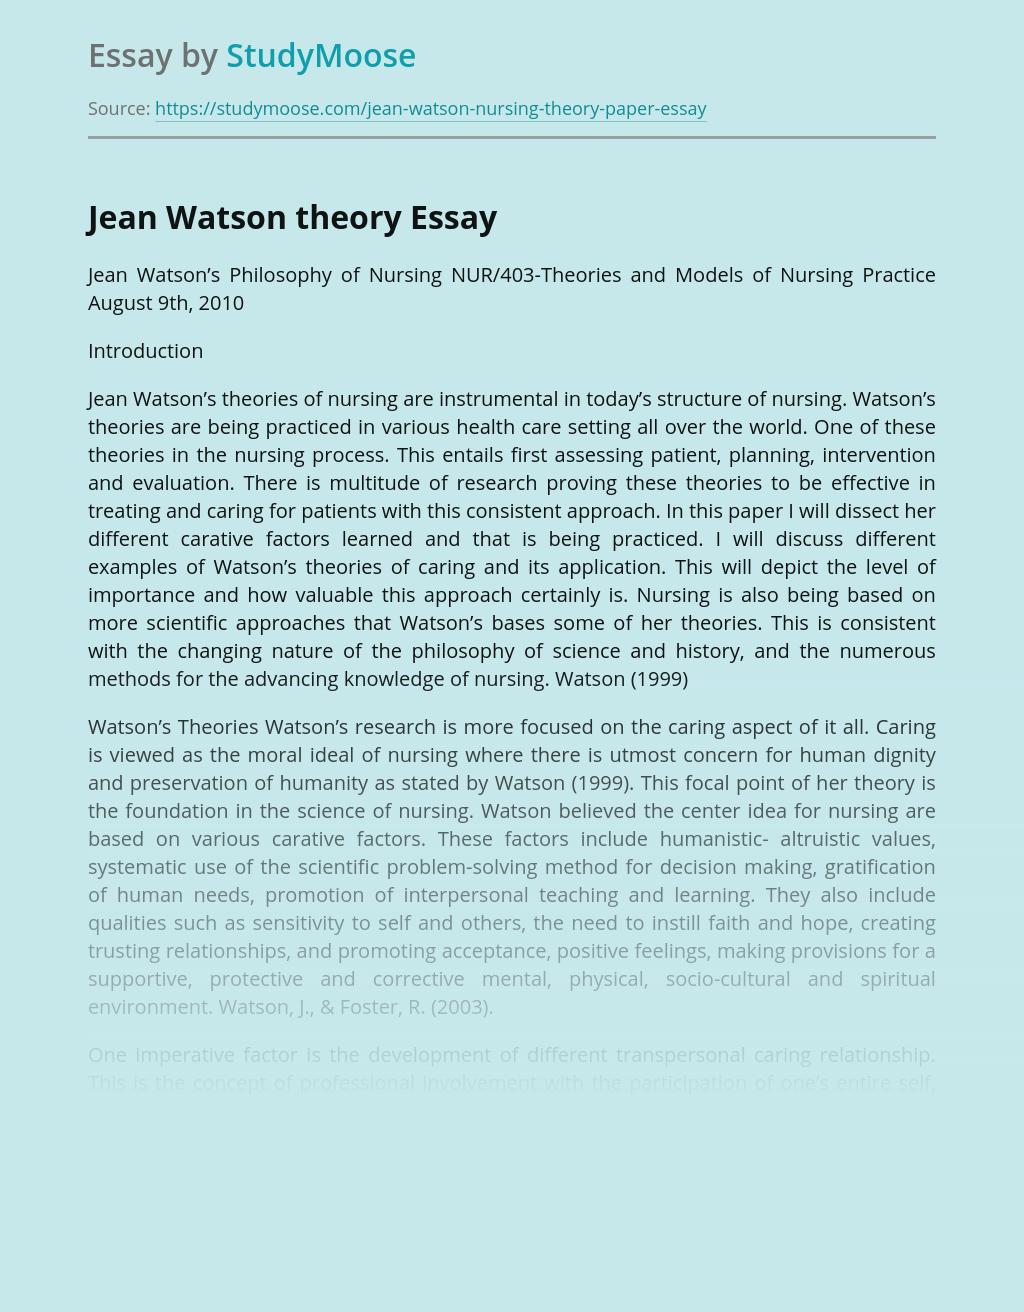 Jean Watson's Theories of Nursing